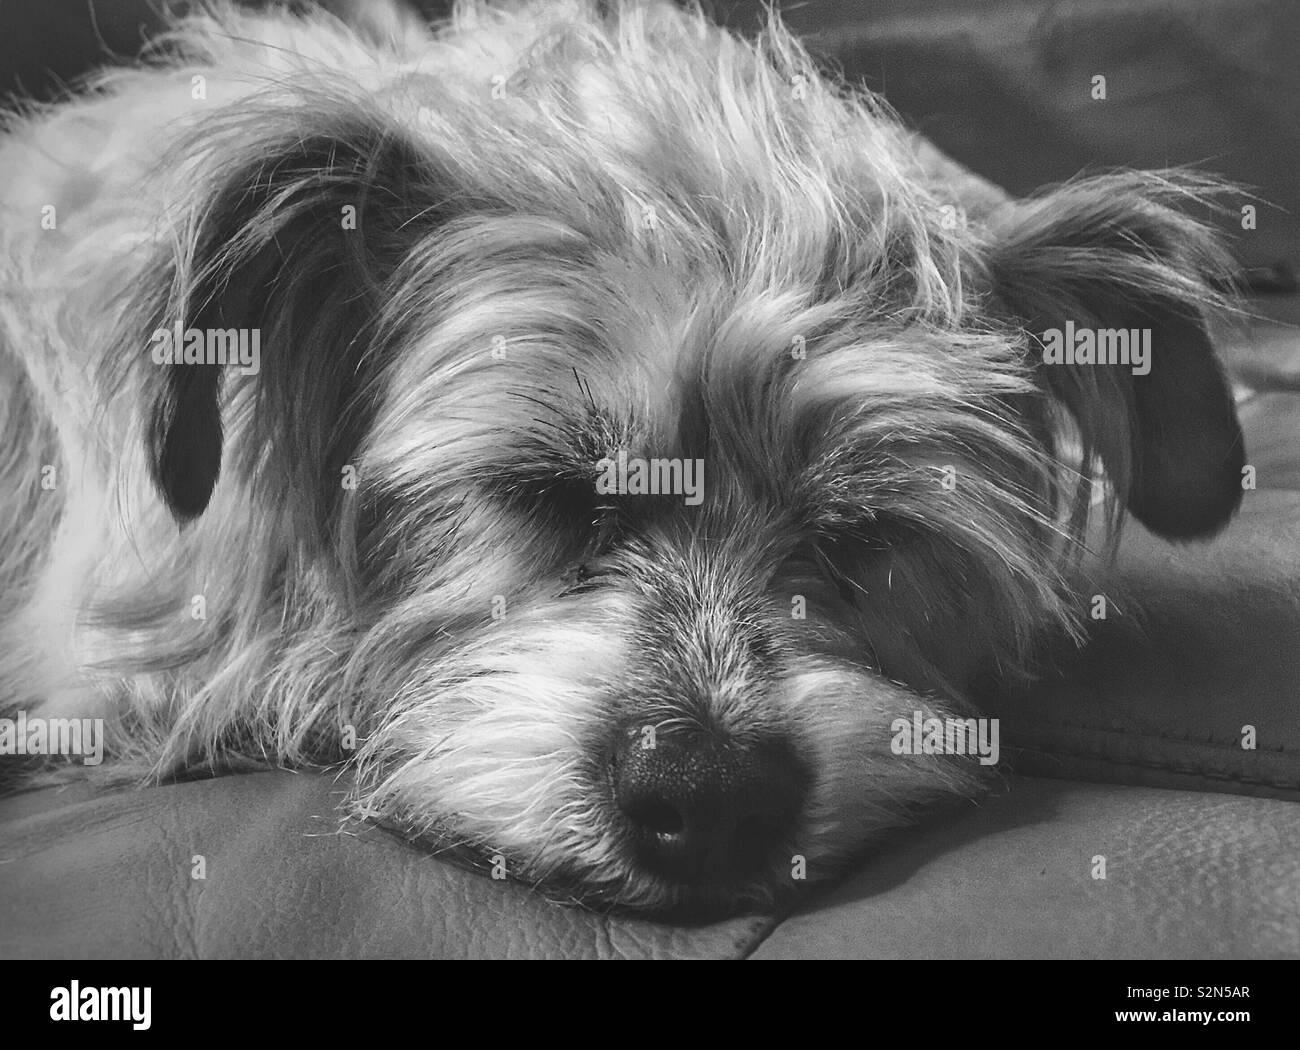 Sleeping Puppy - Stock Image